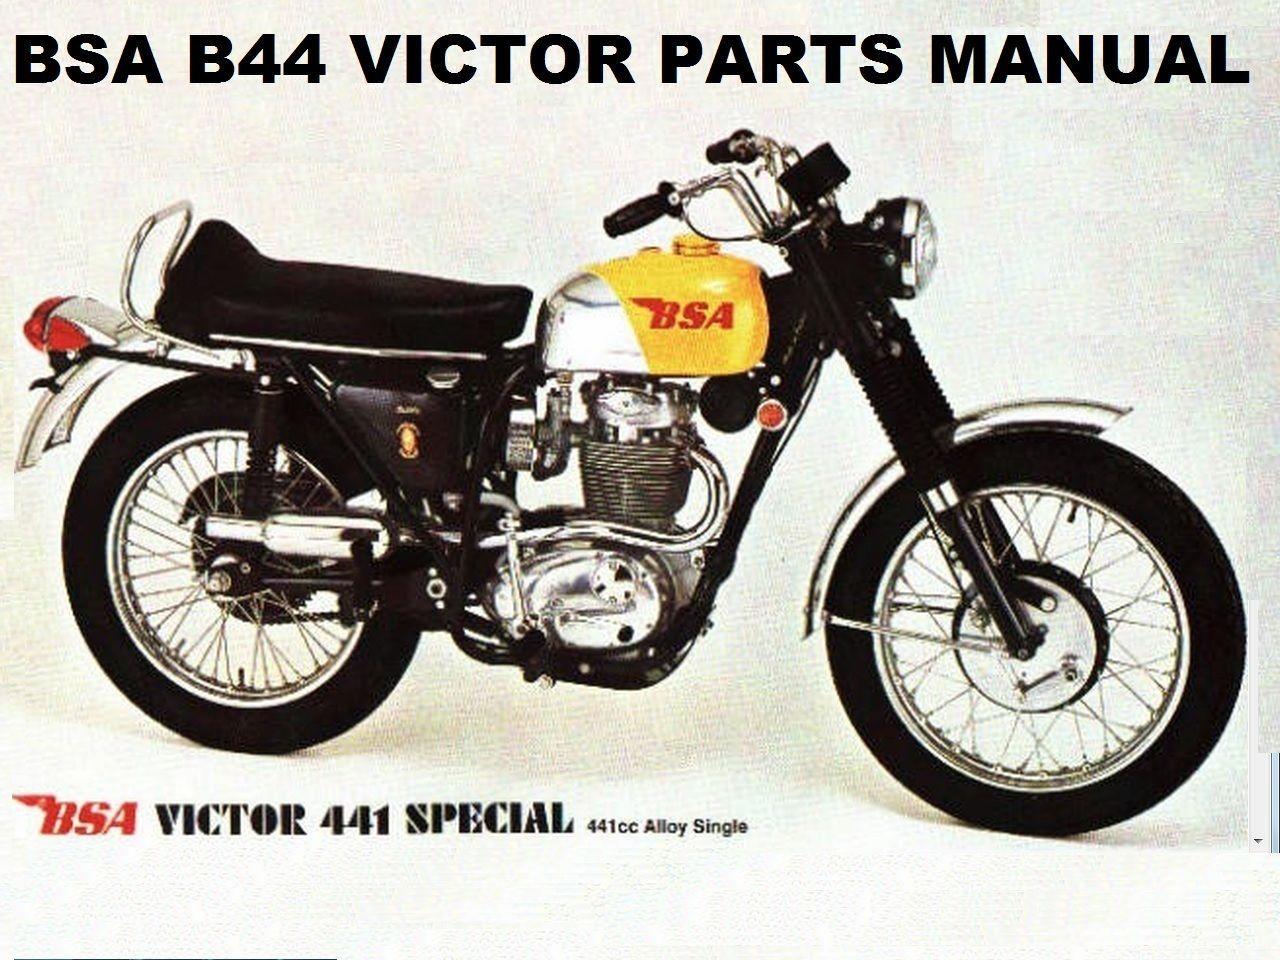 BSA B44 VICTOR SPECIAL PARTS MANUAL w/ B-44 Motorcycle Service & Repair  Diagrams